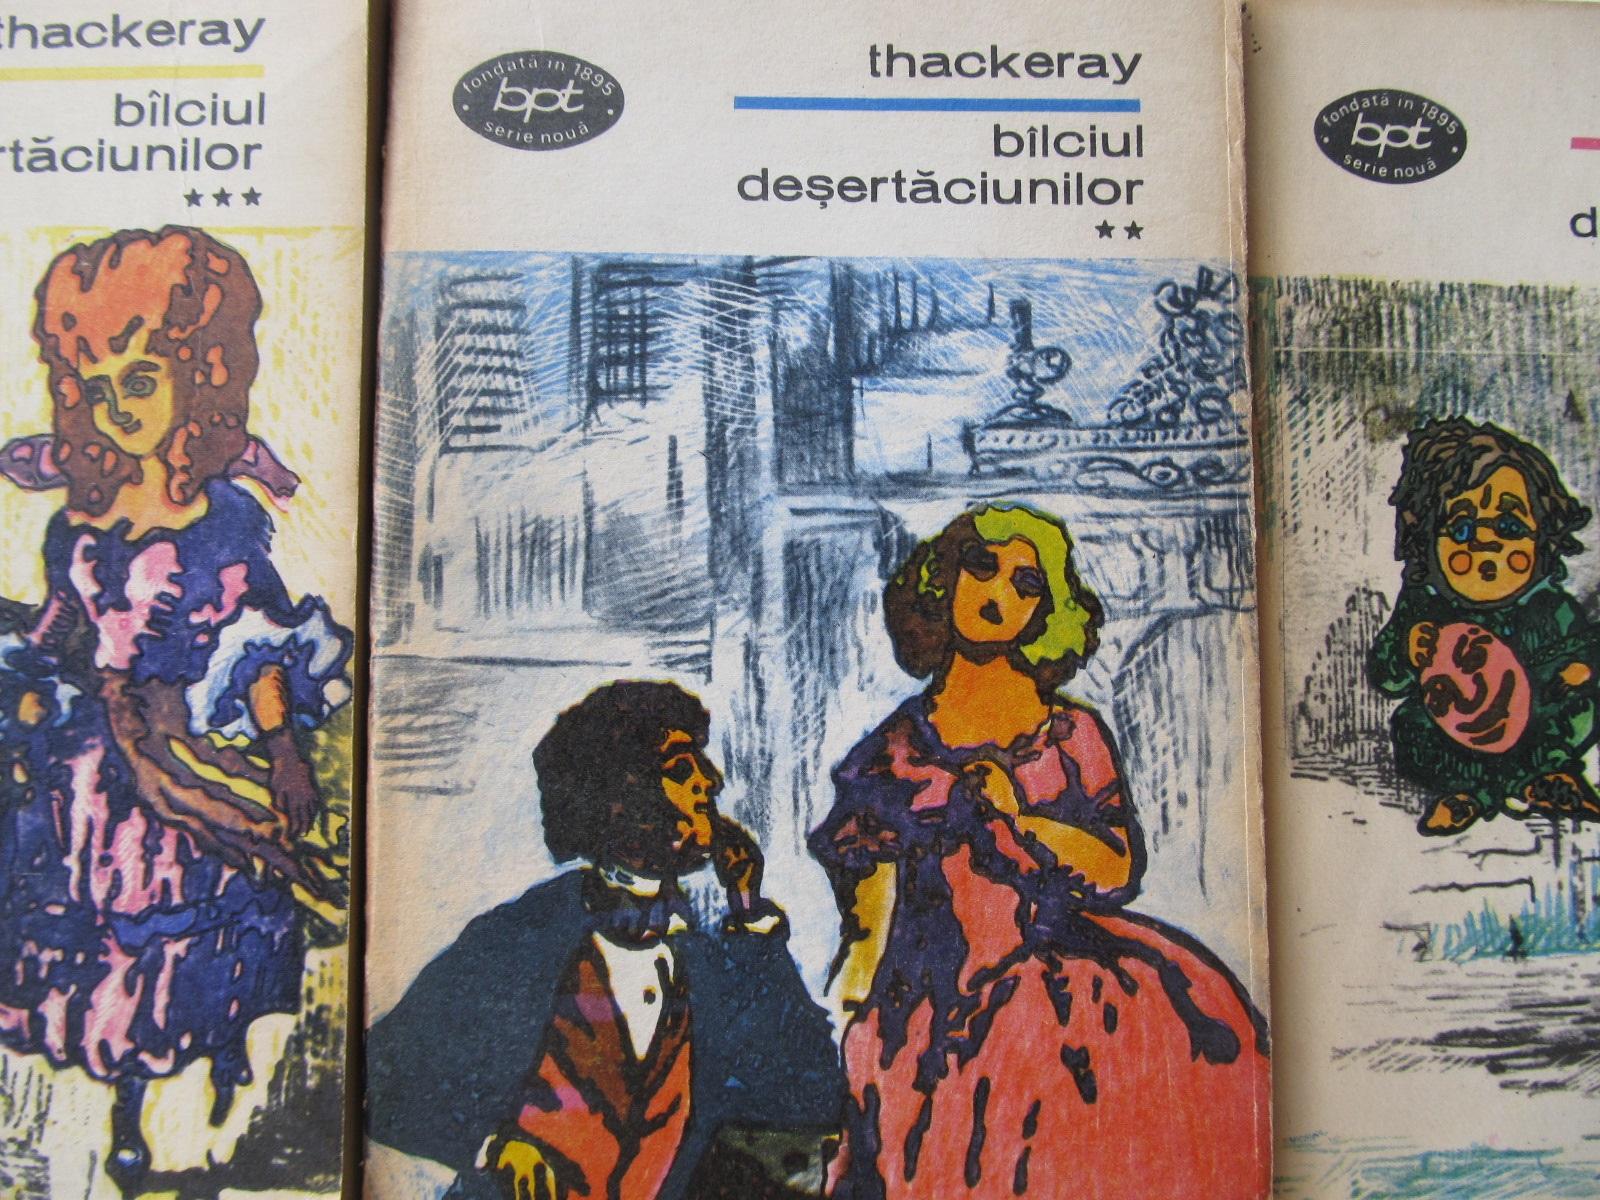 Balciul desertaciunilor (3 vol.) - W. M. Thackeray | Detalii carte